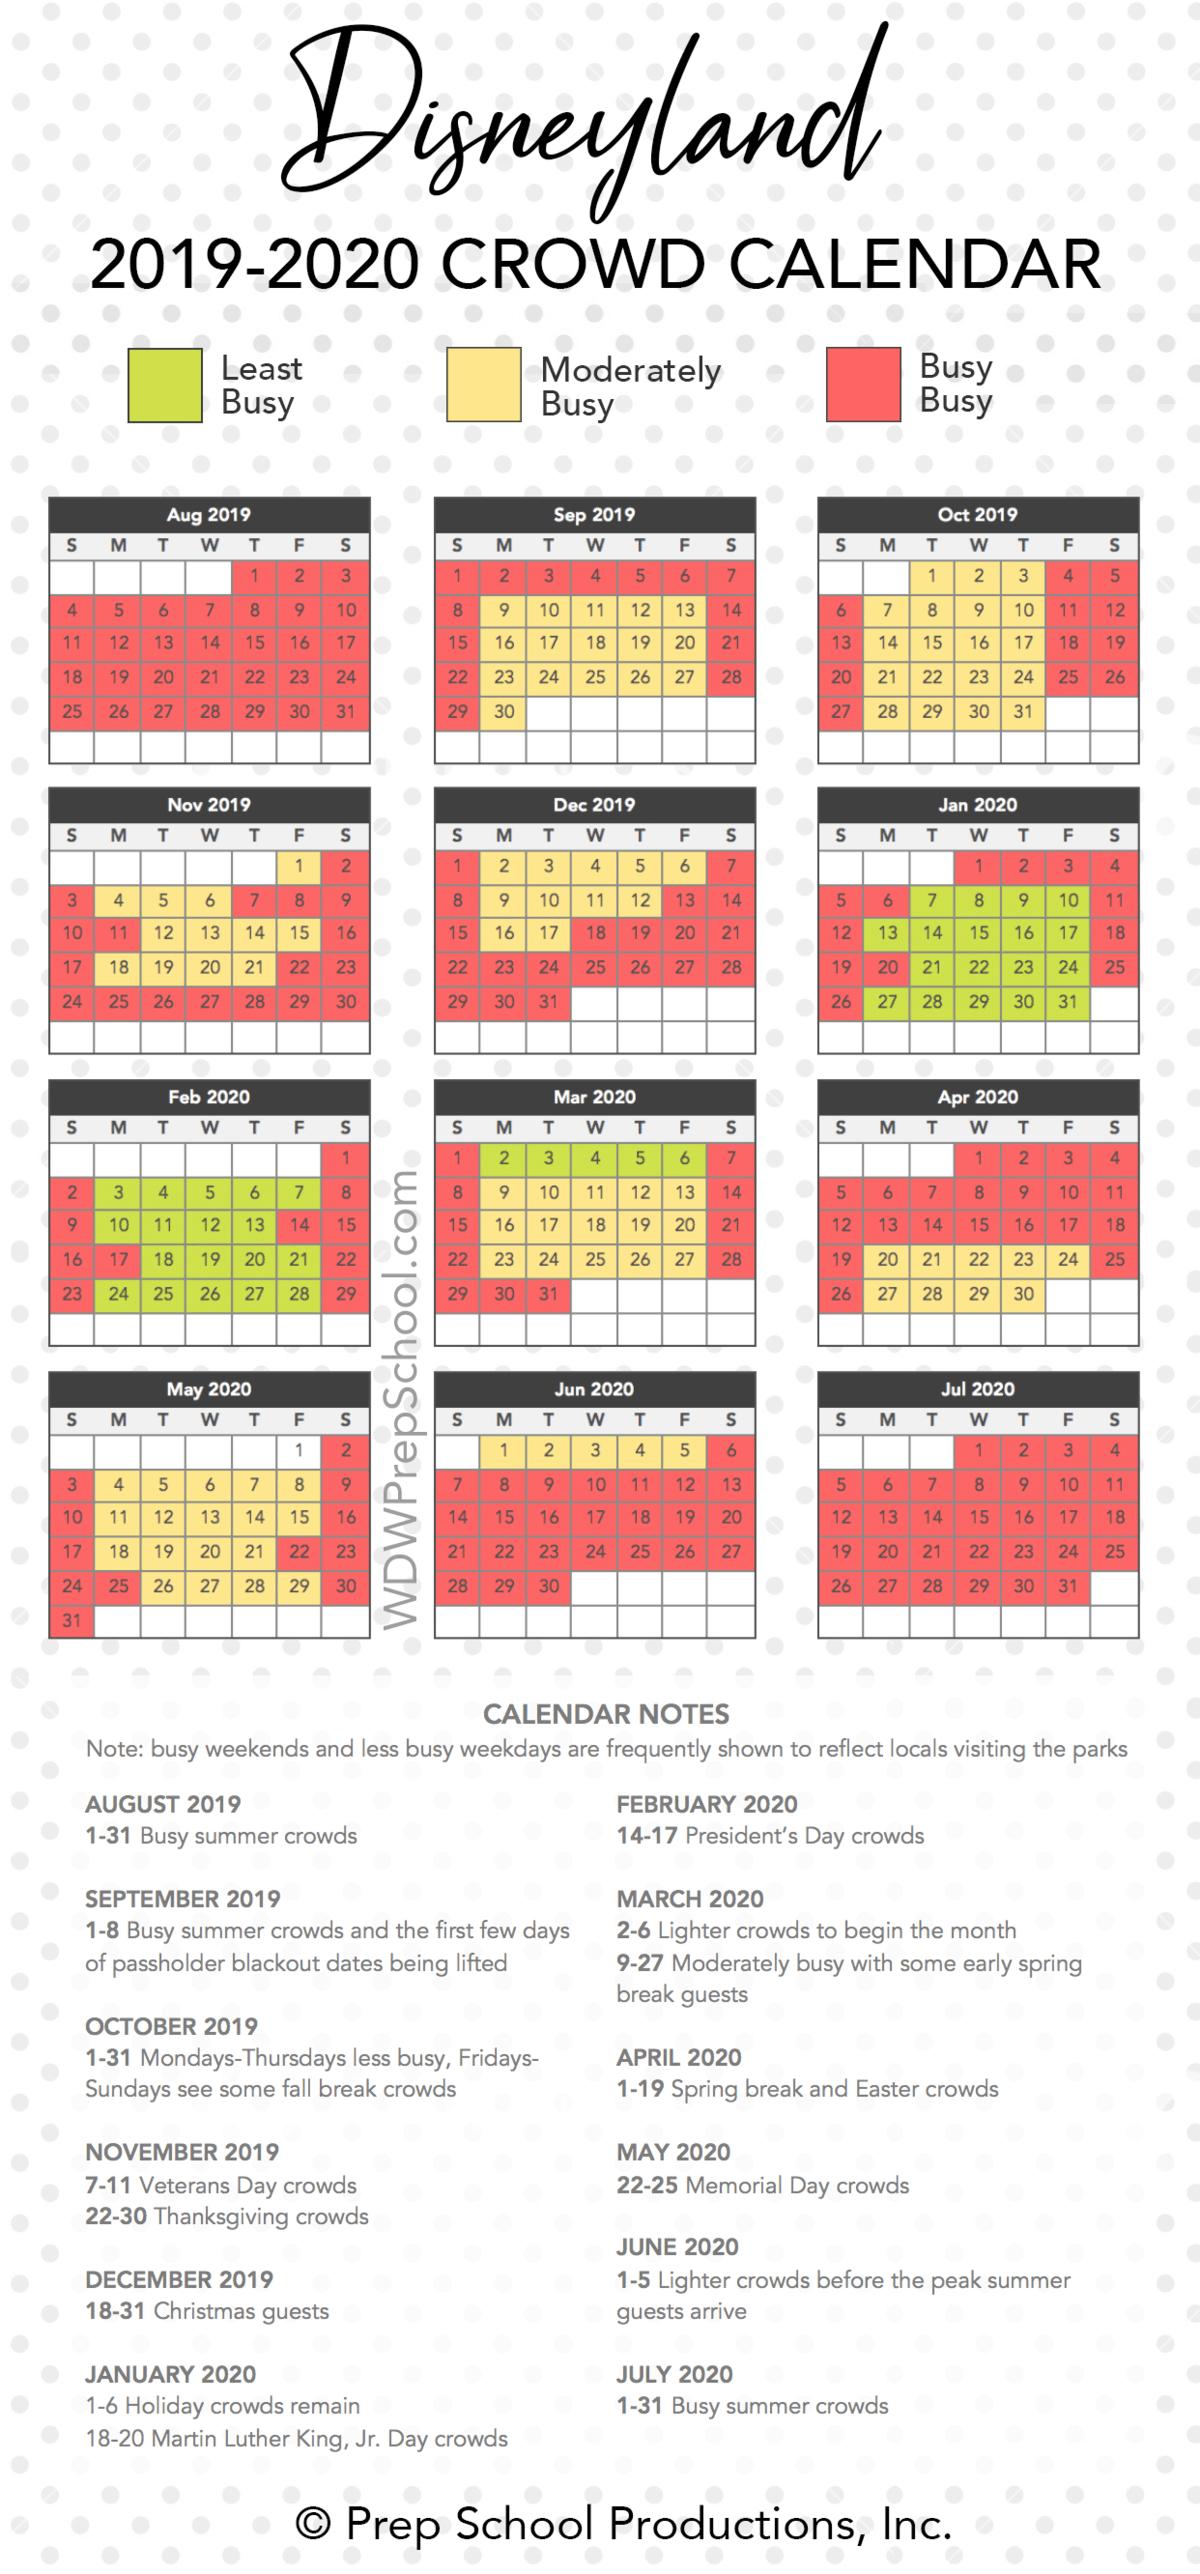 Disneyland 2019-2020 Crowd Calendar